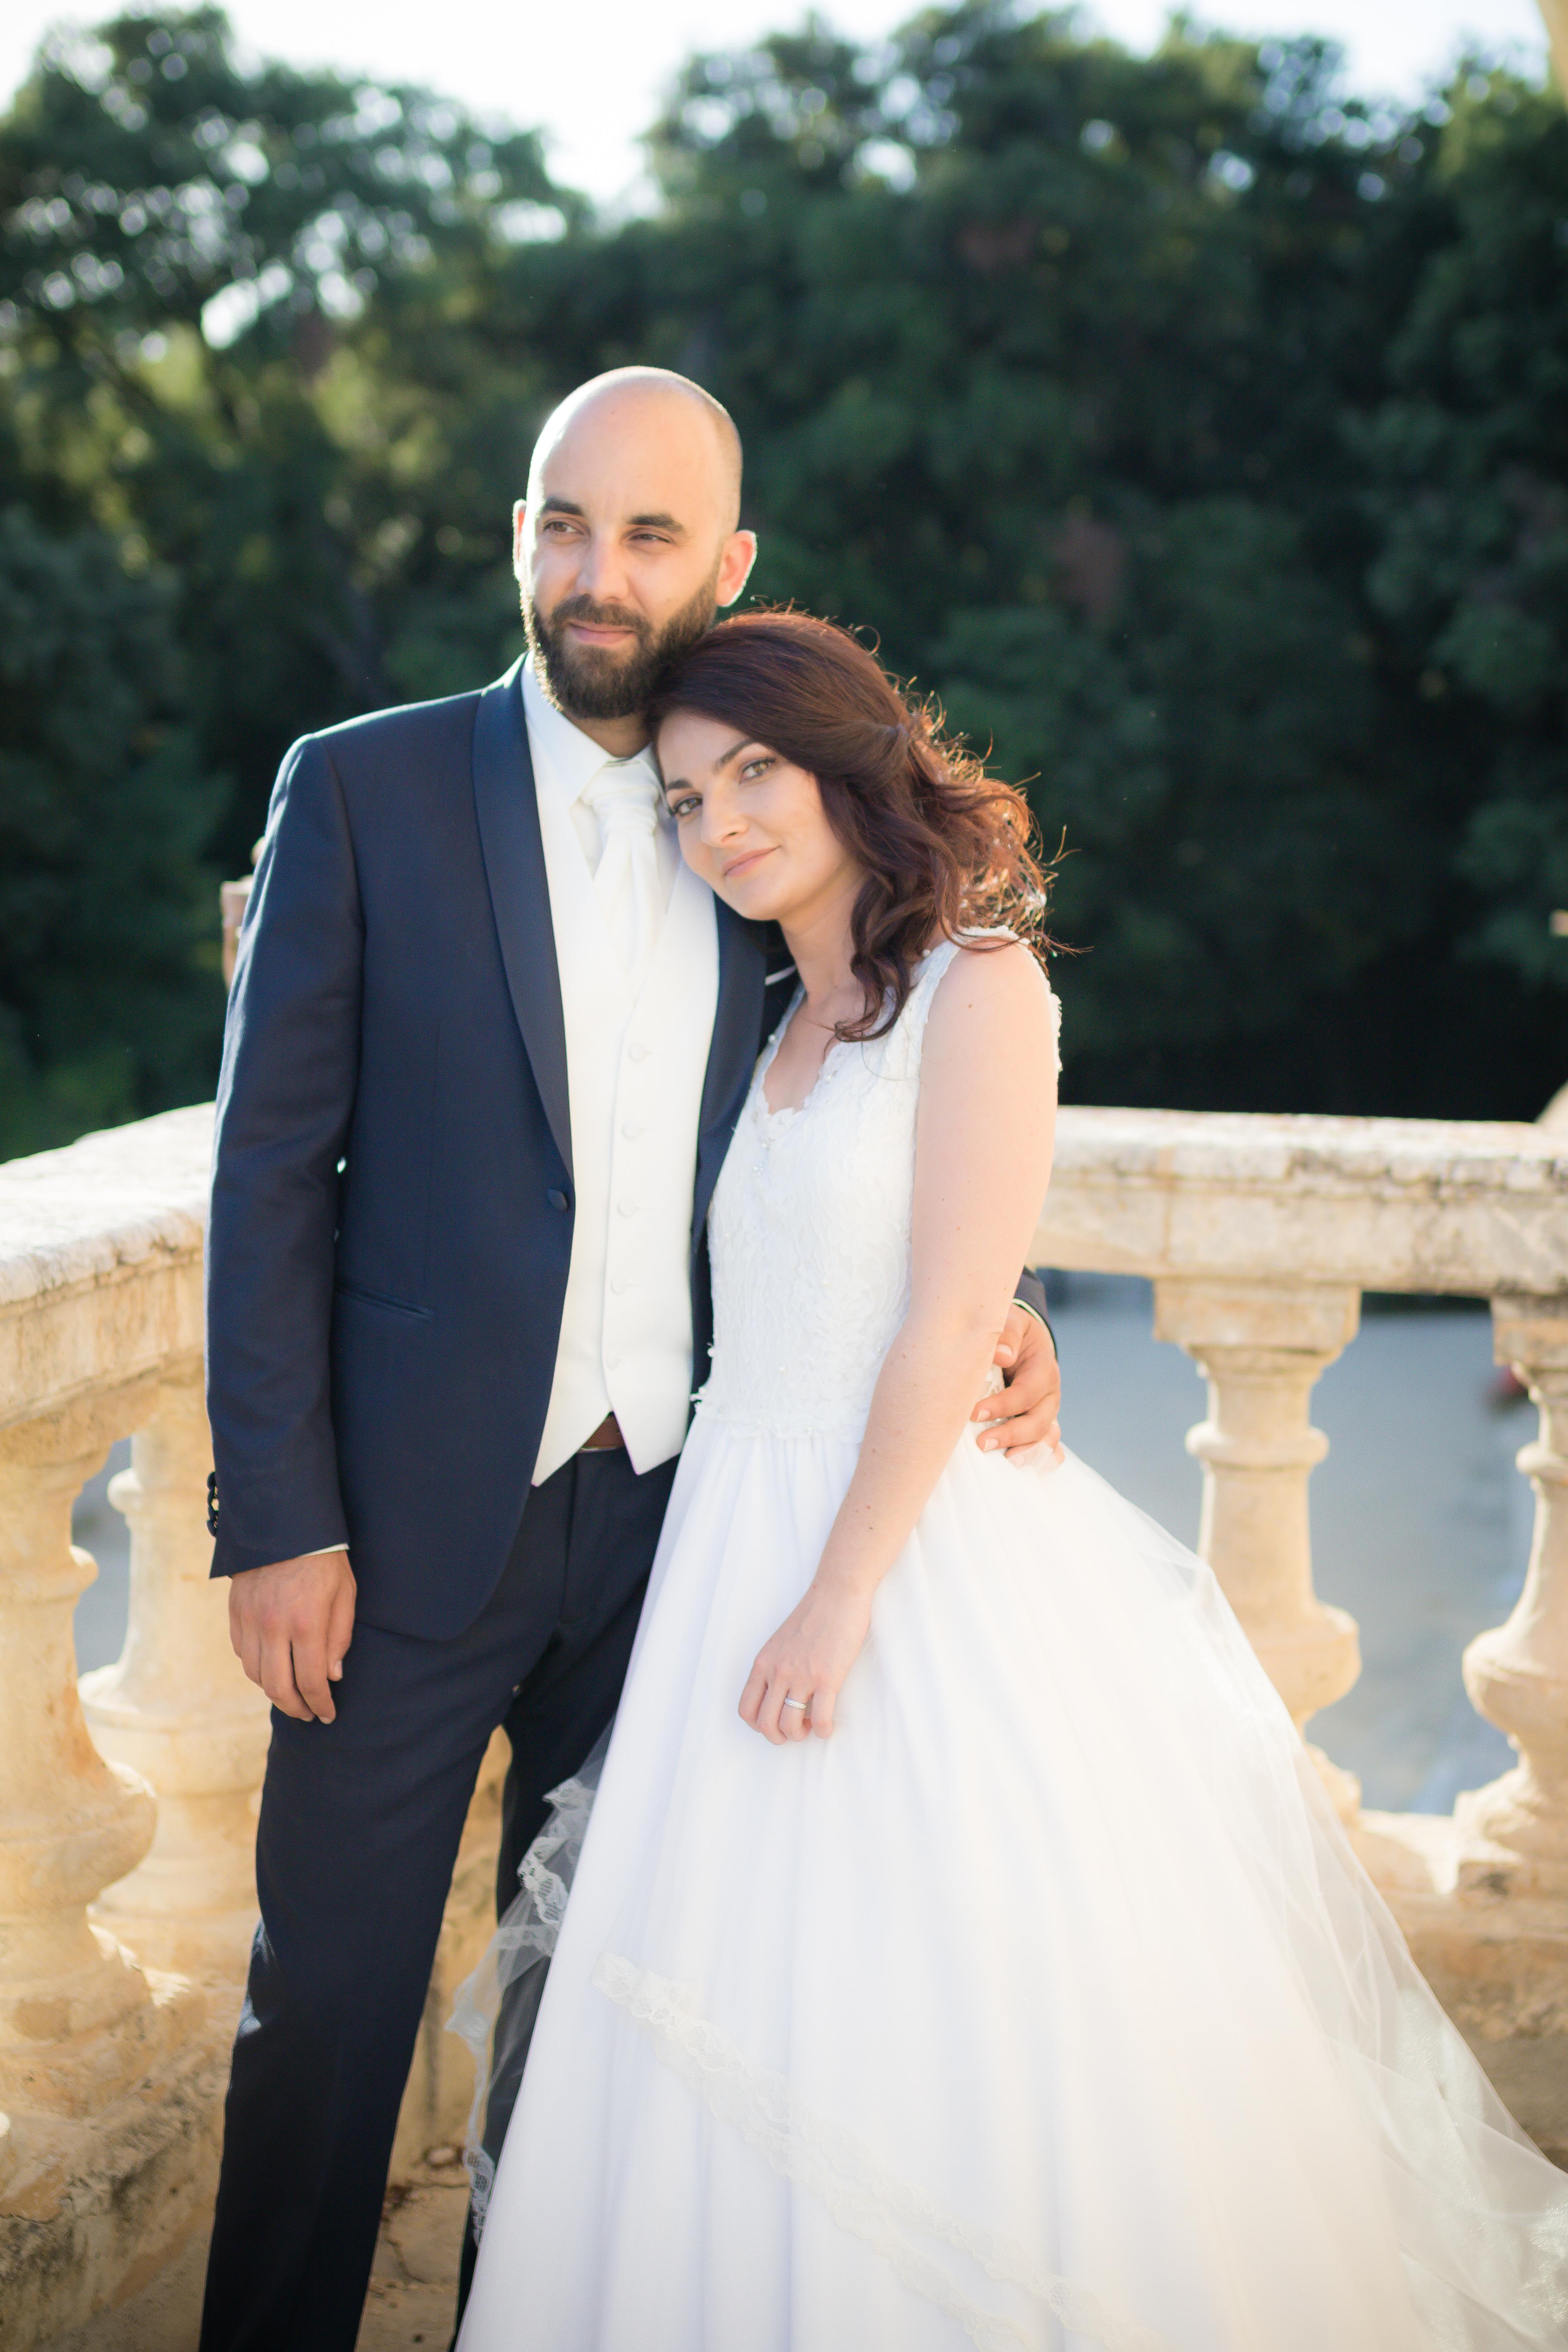 anais roguiez photographe france paris montpellier wedding luxe mariage 34